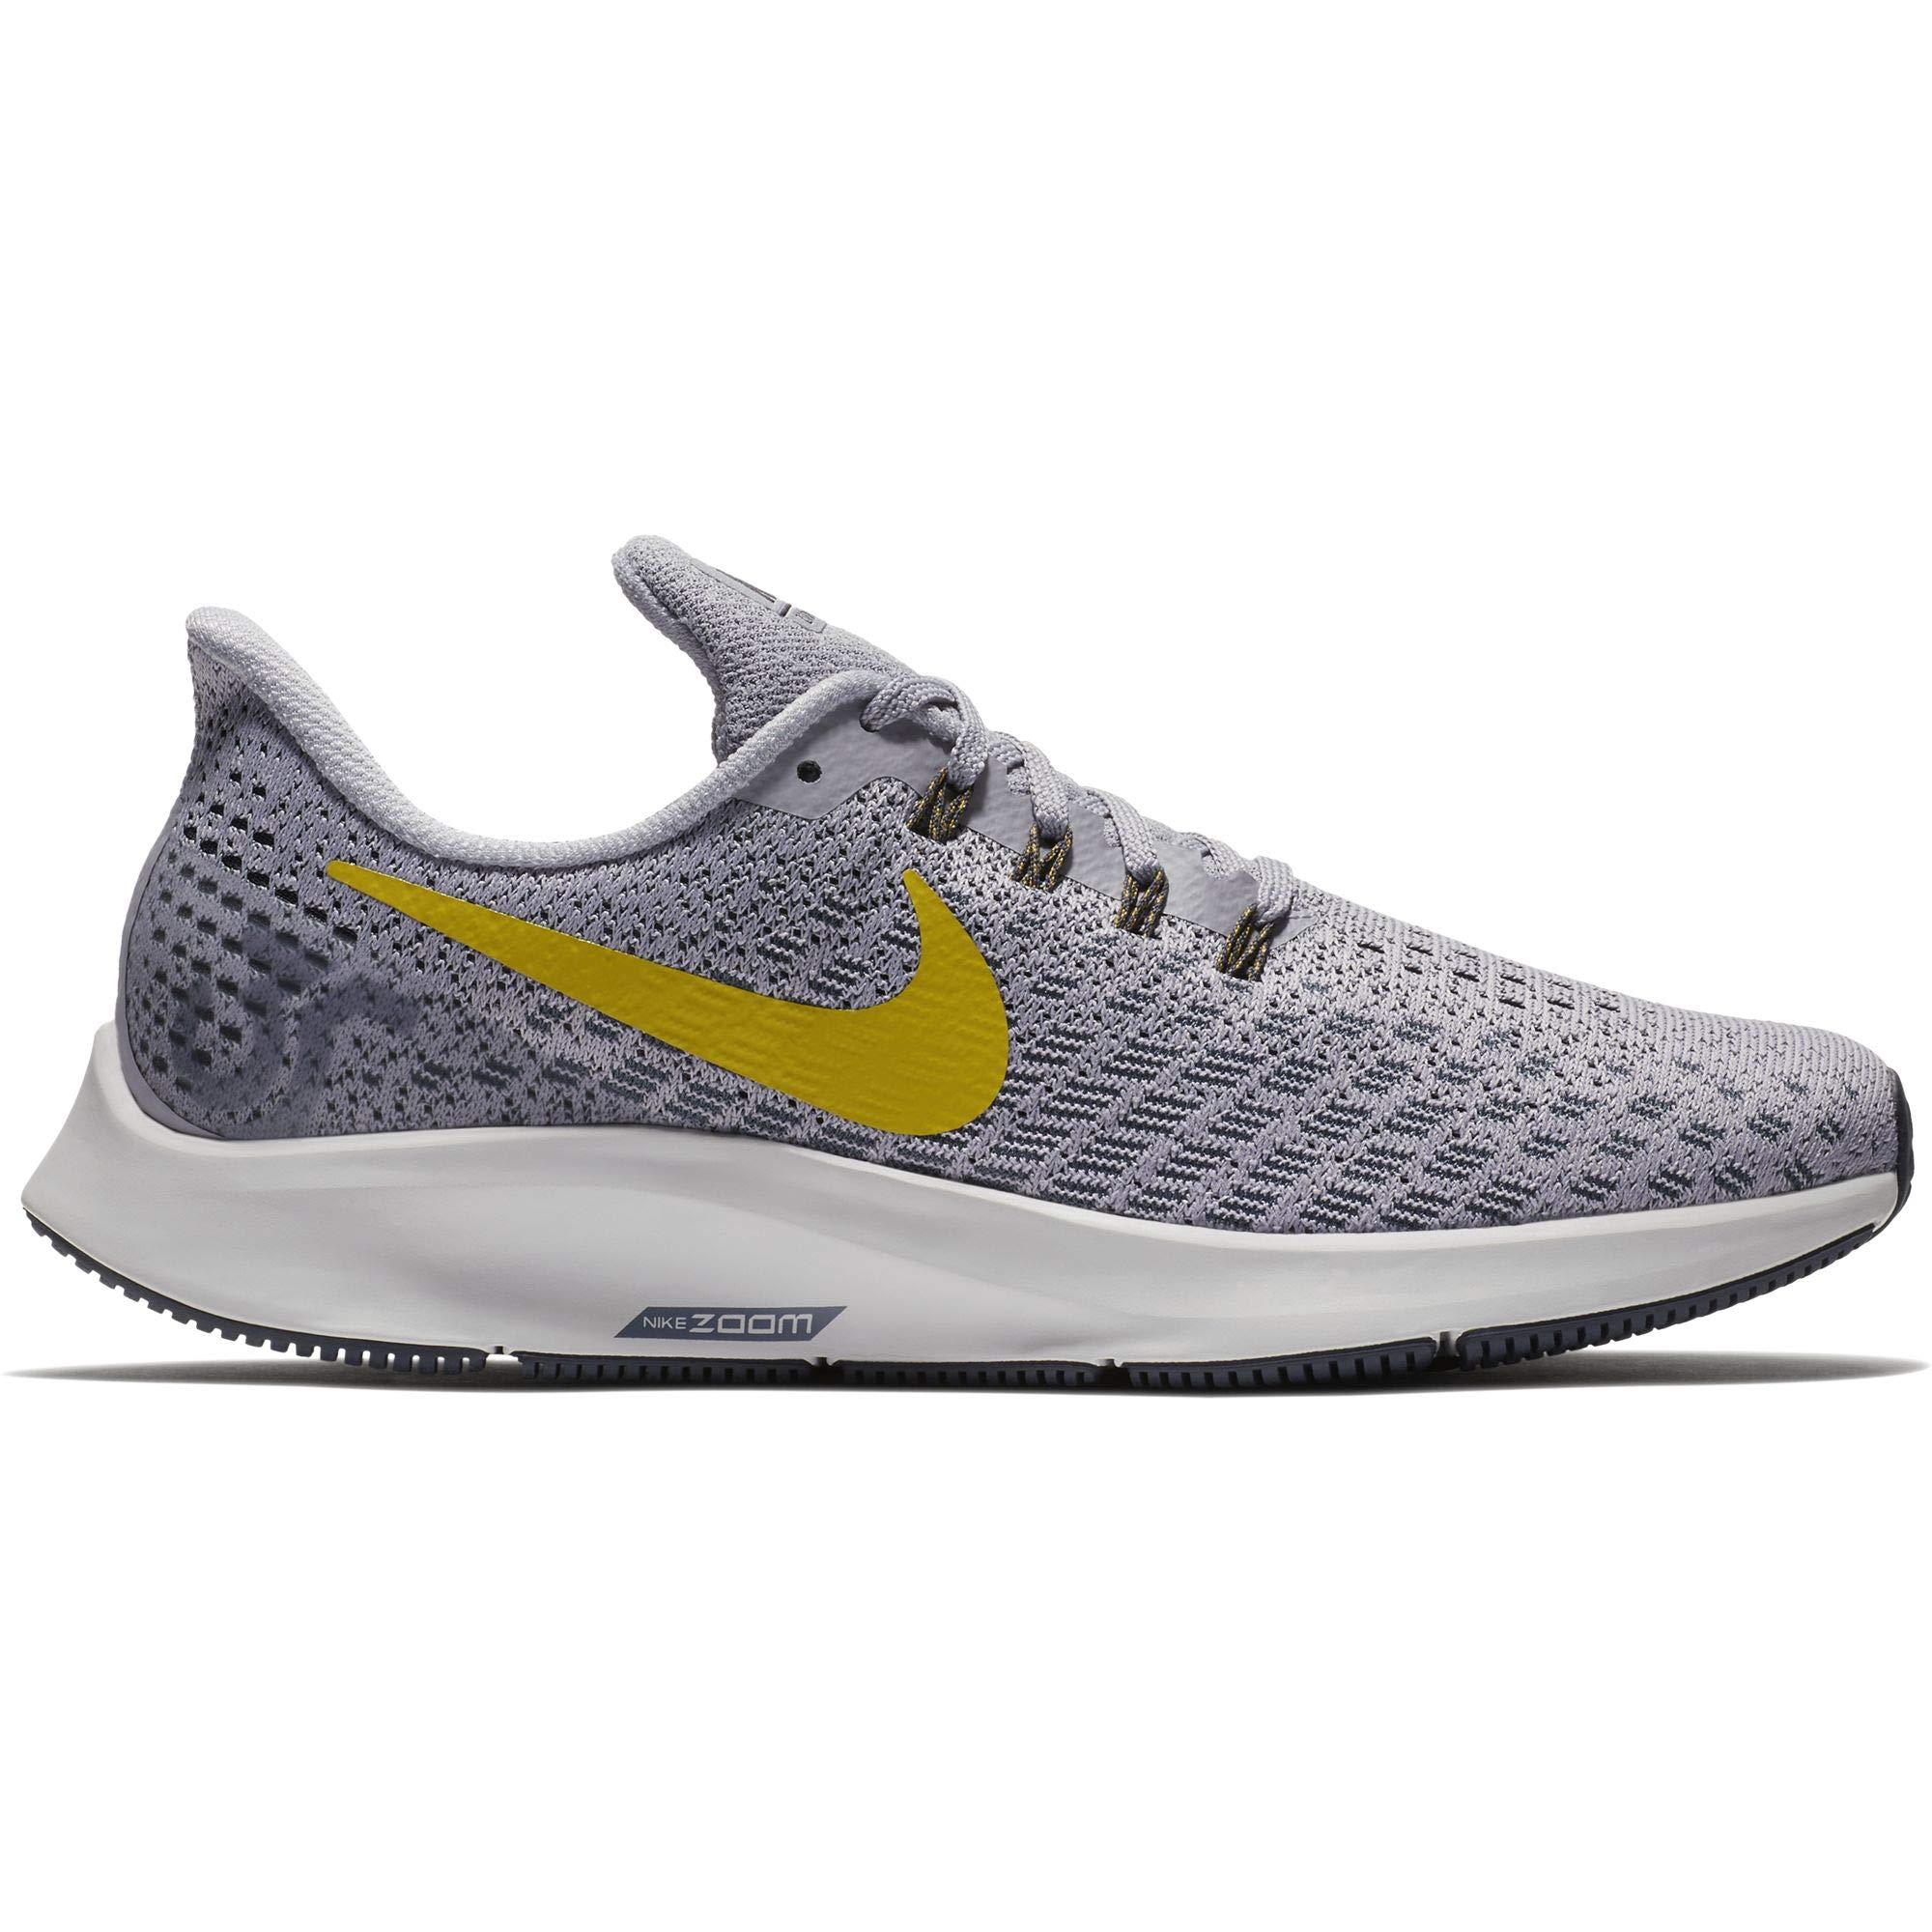 36b95cfebeef Galleon - Nike Women s Zoom Pegasus 35 Running Shoe Provence Purple Dark  Citron Gridiron Size 7 M US